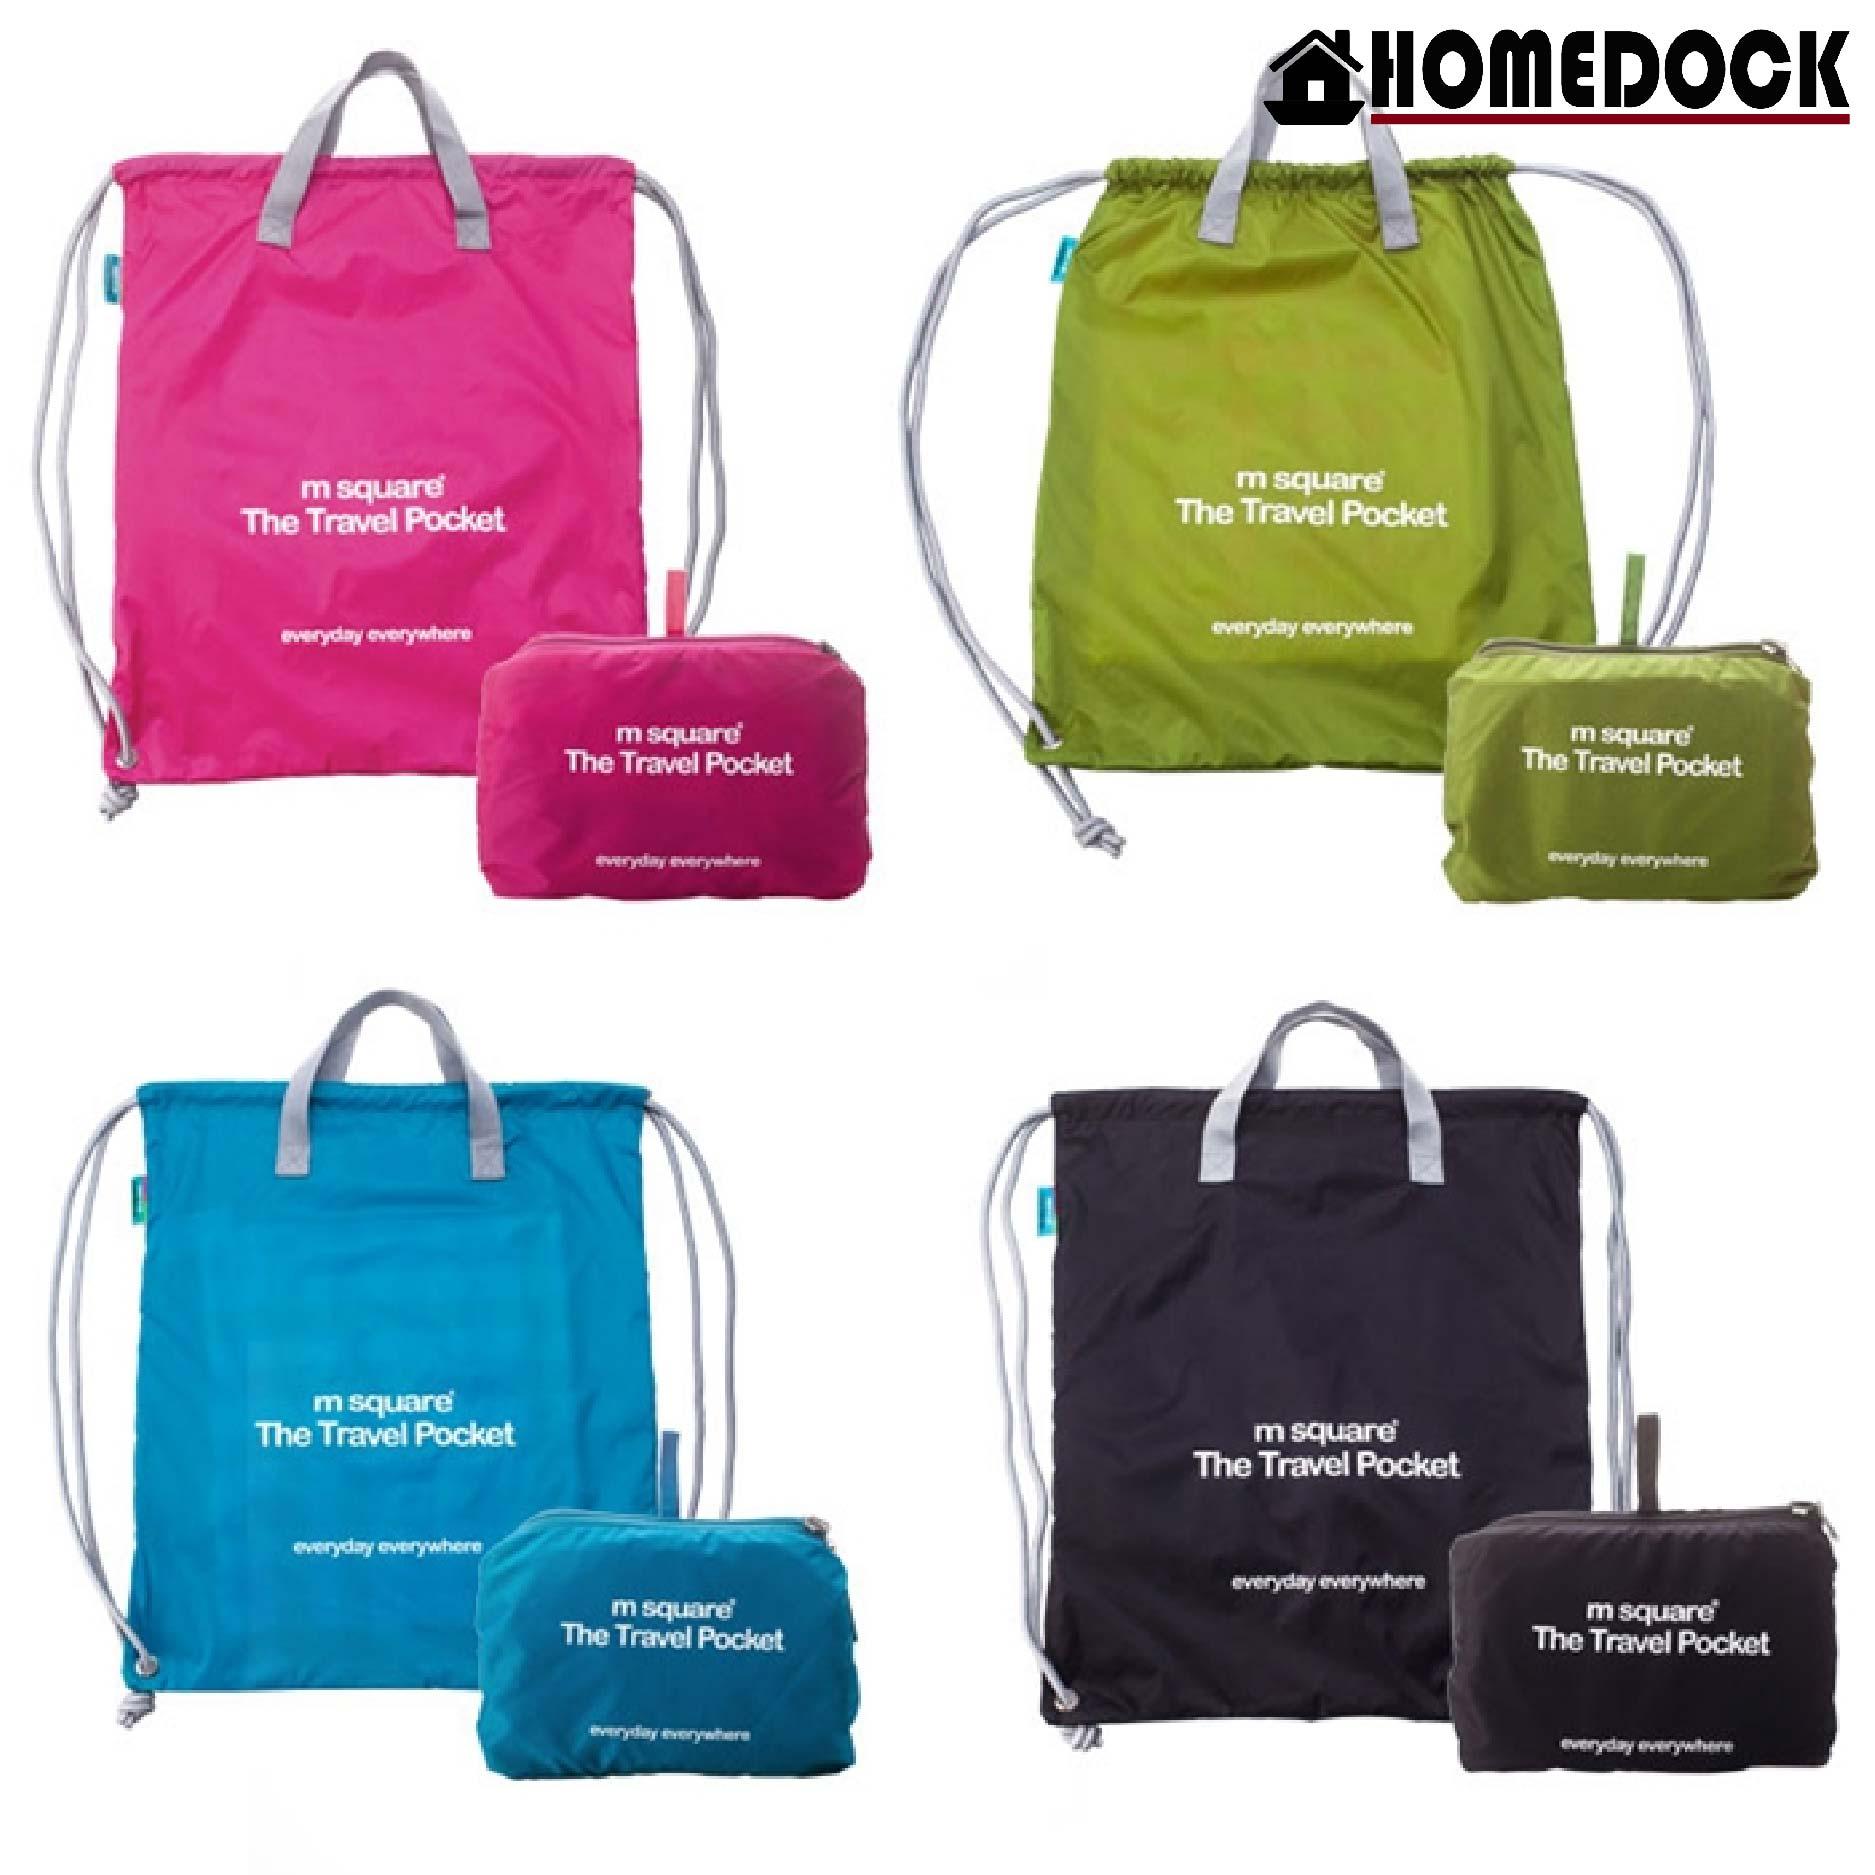 M Square 防水雙肩束口後背包 /束口包/購物袋/購物包/隨身包/衣物收納/旅行包/